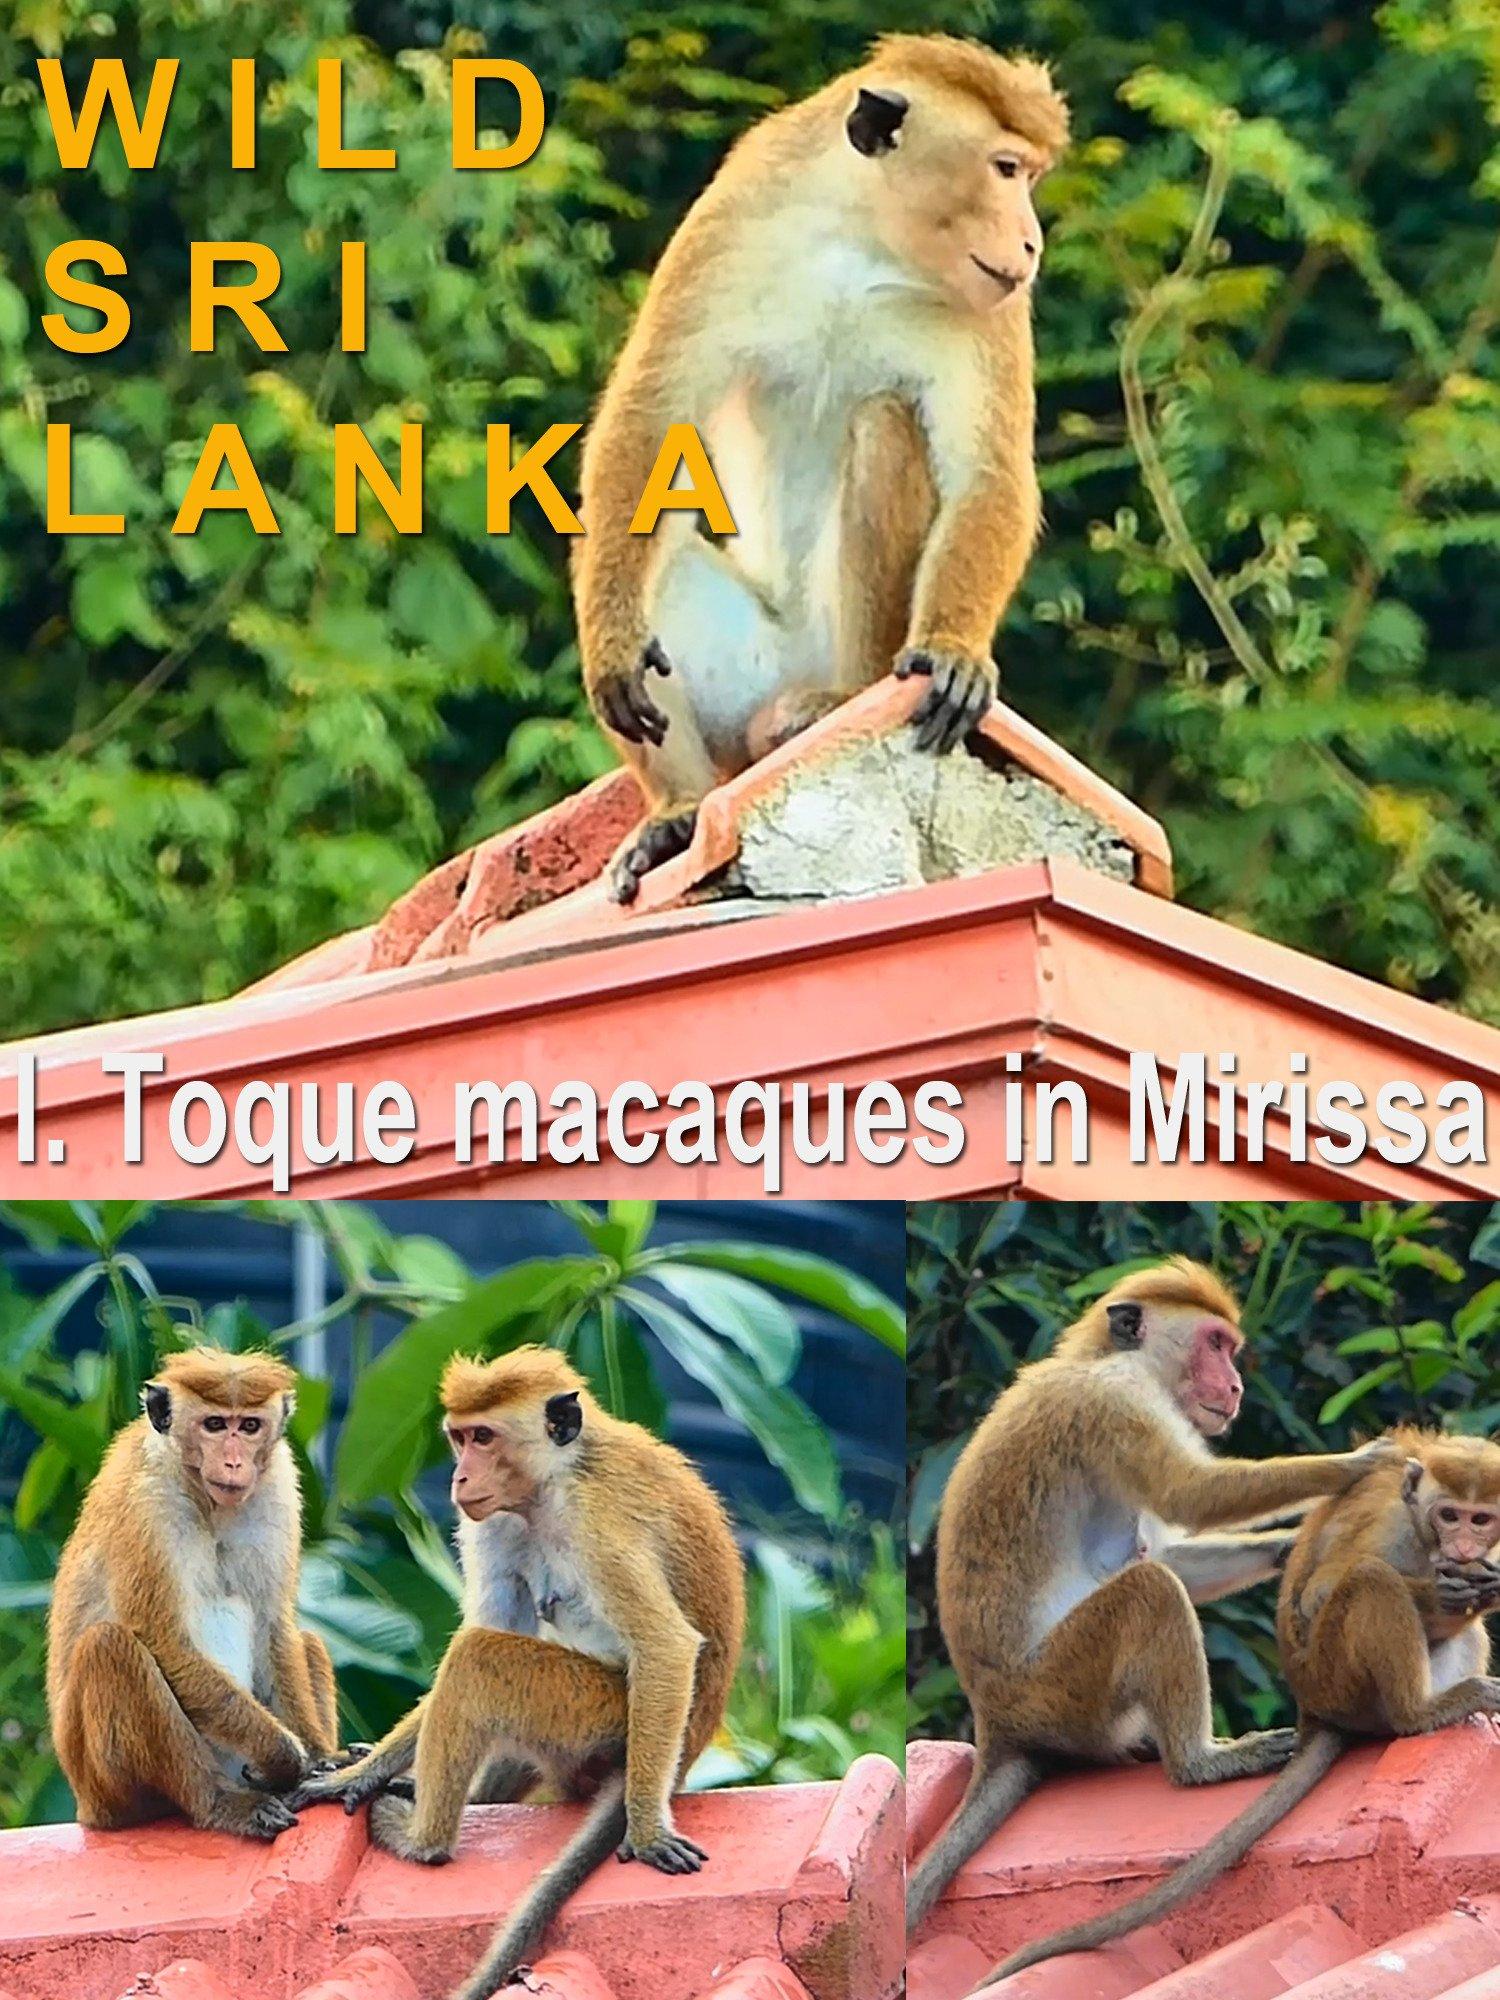 Wild Sri Lanka. I. Toque macaques in Mirissa by